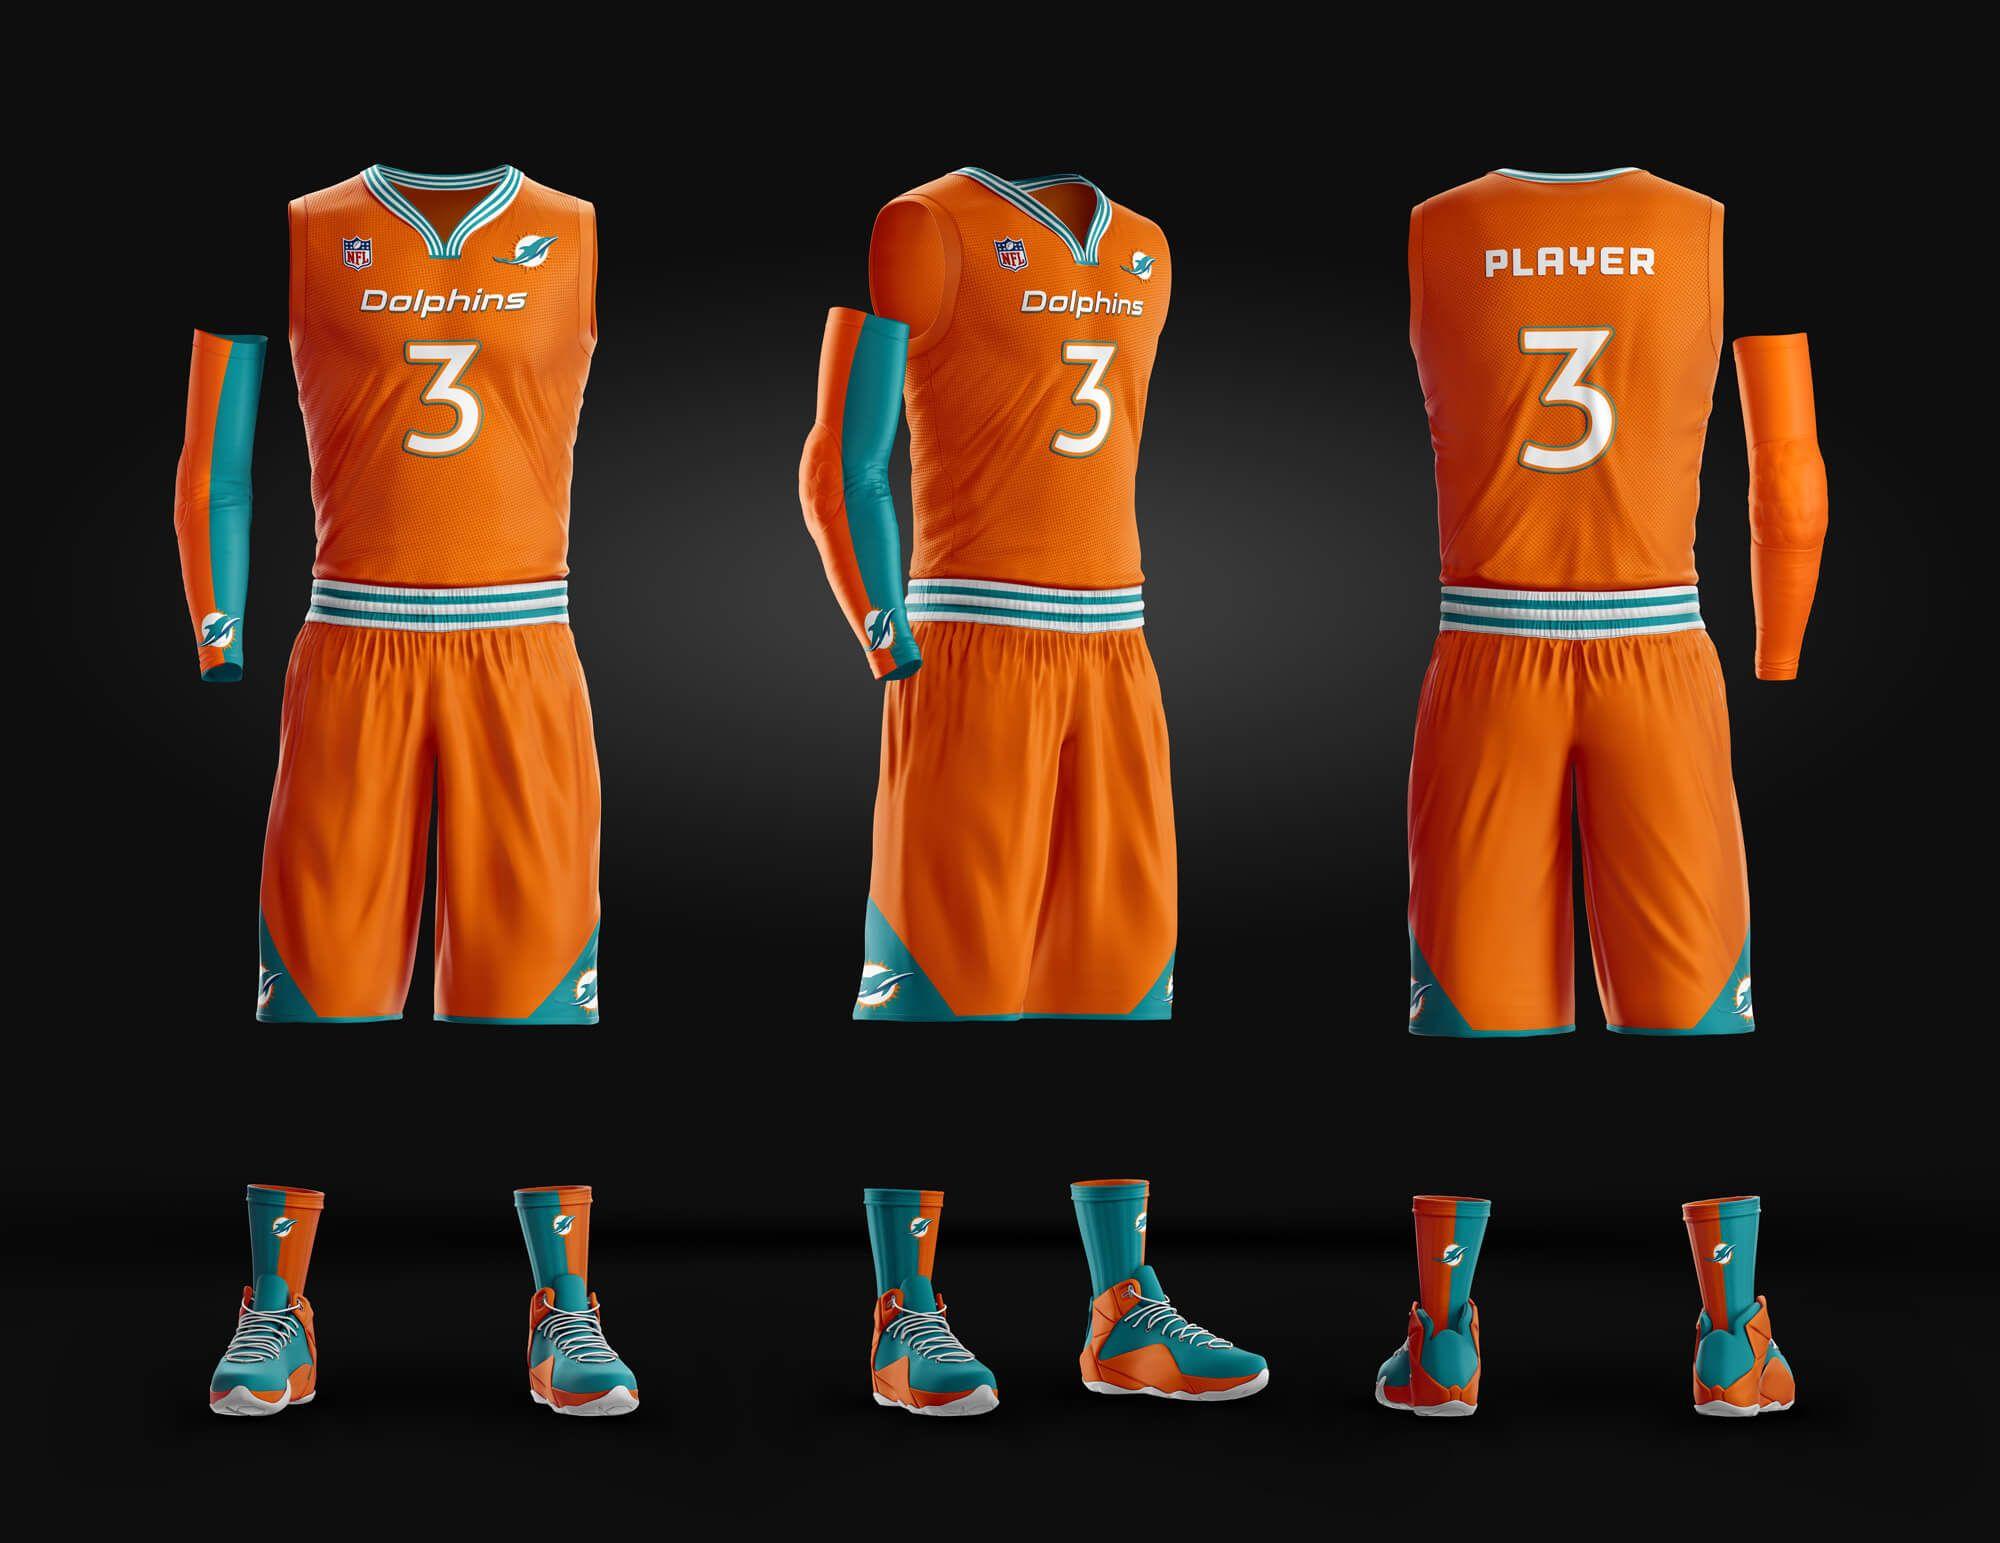 Download Basketball Photoshop Uniform Psd Template Dolphins Basketball Uniforms Basketball Uniforms Design Sports Uniform Design